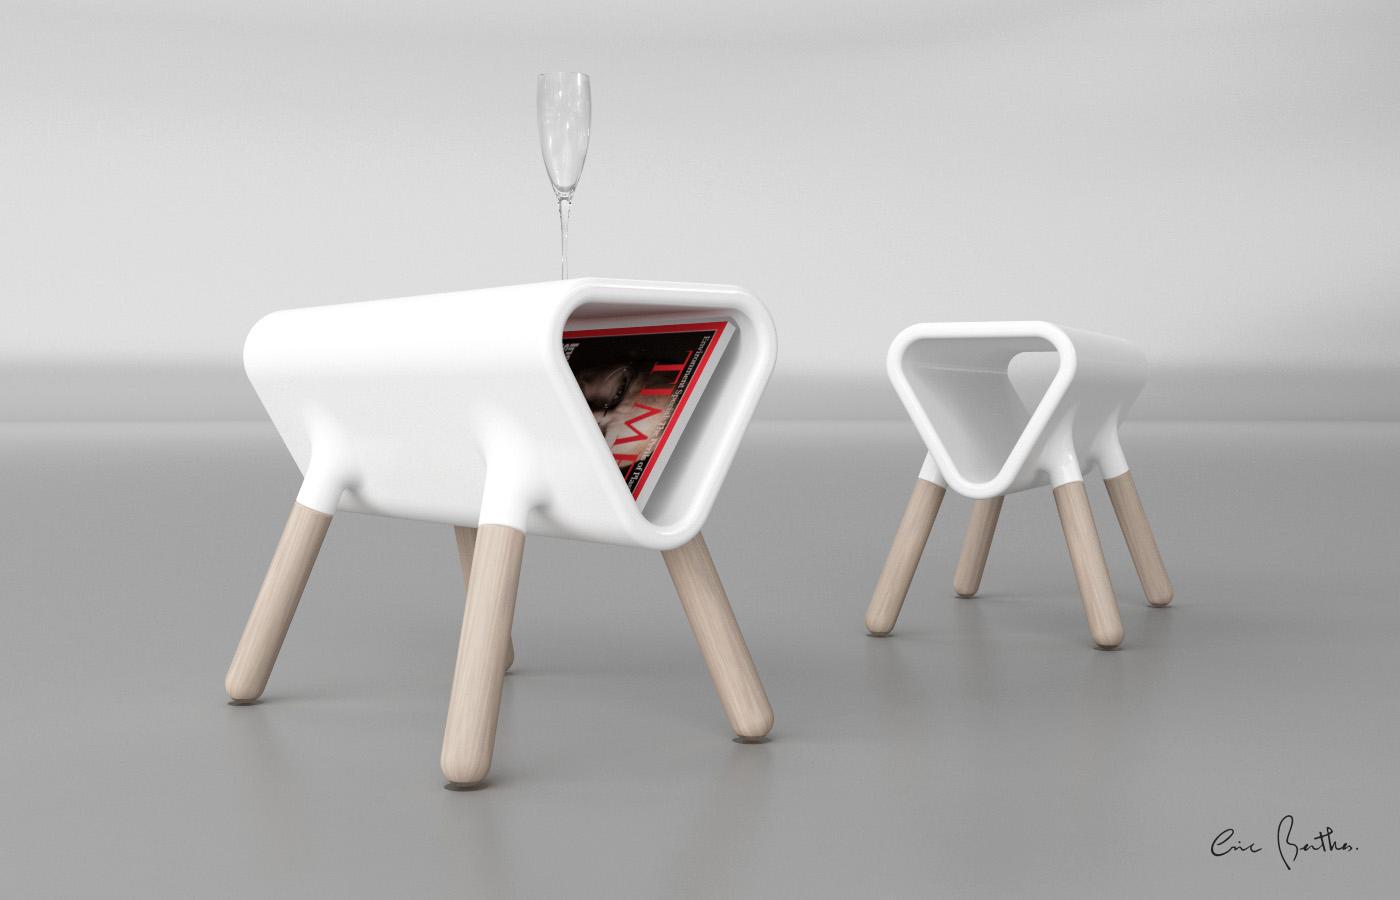 Branex-design-mobilier-paris-planetdesign-eric-berthes-02.jpg